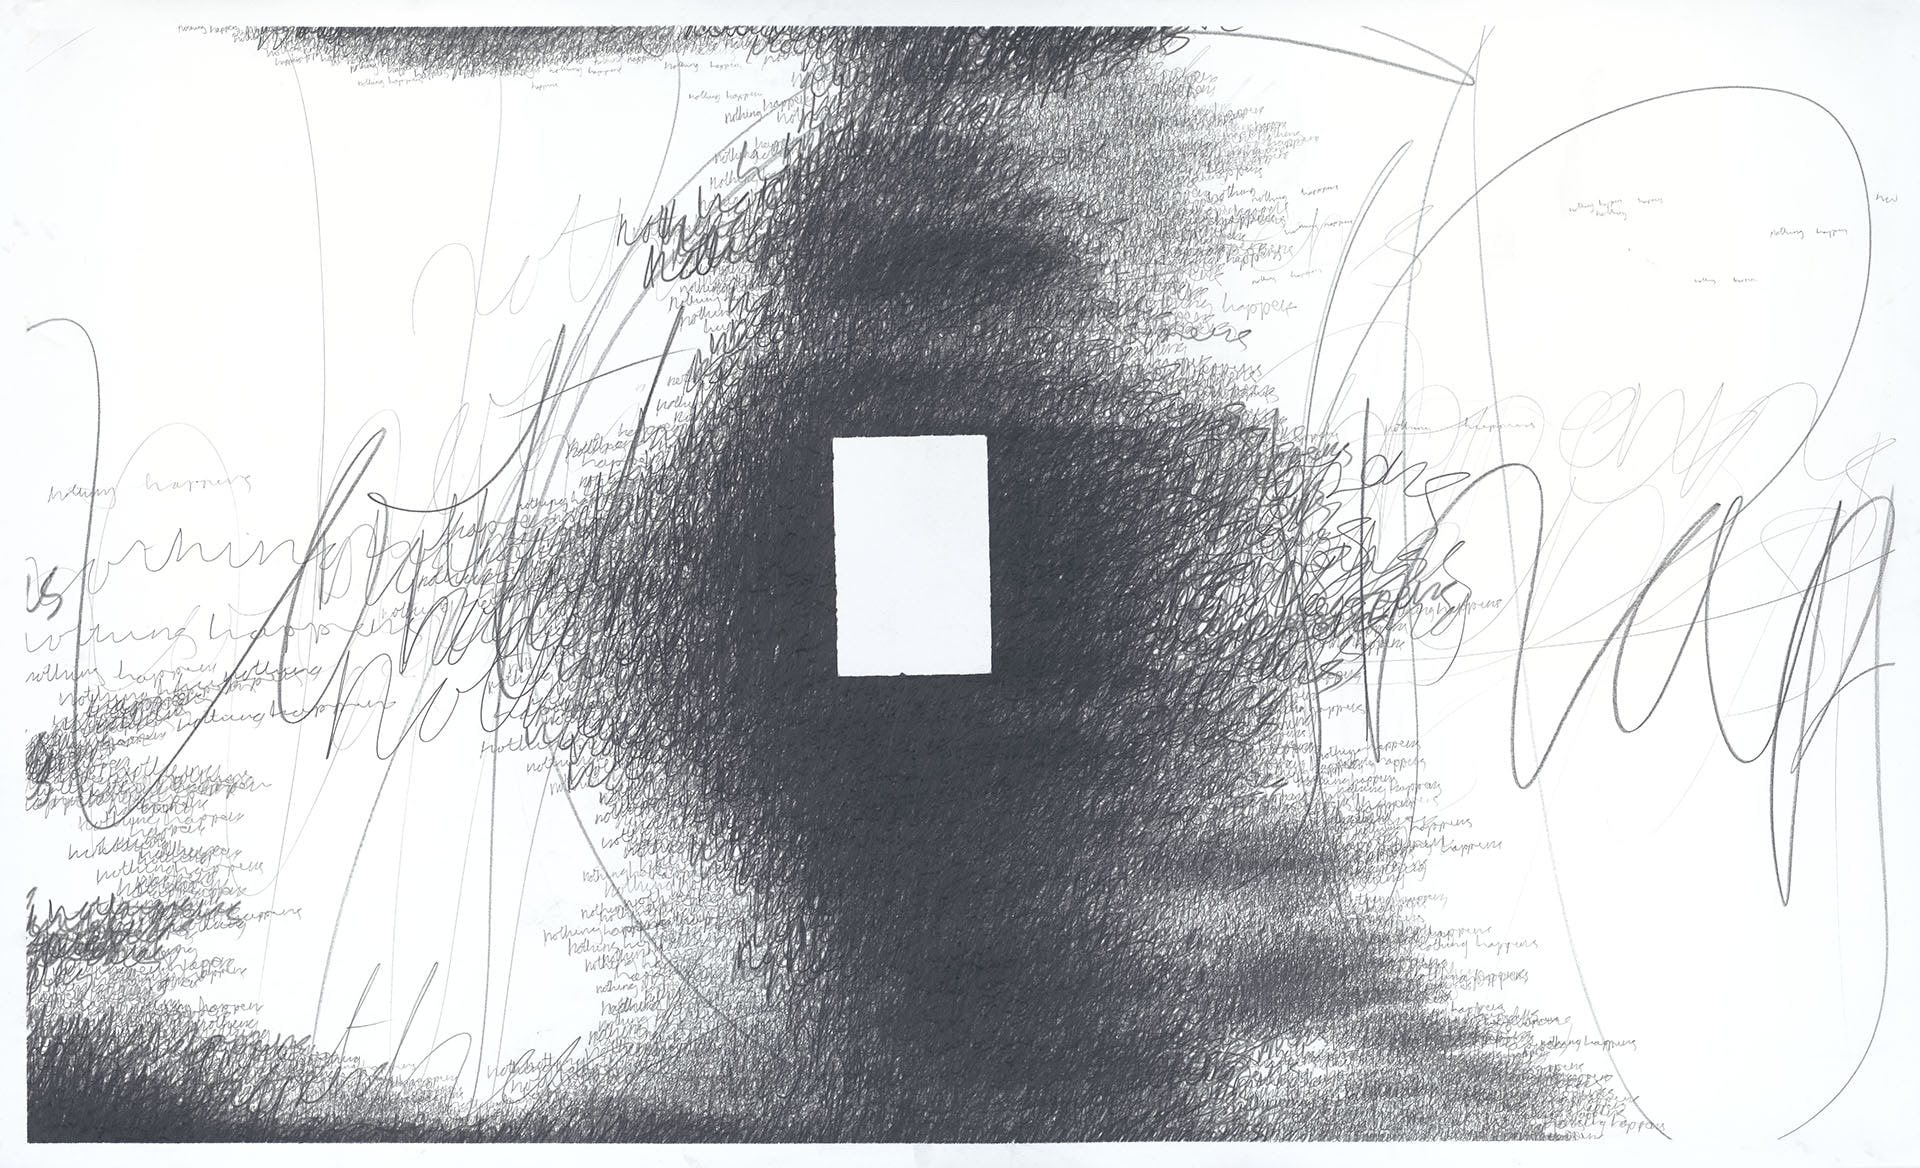 Nothing Happens (facsimile) 2018–2019 9B graphite crayon and 2B graphite pencil on Fabriano Artistico paper, 164×100cm